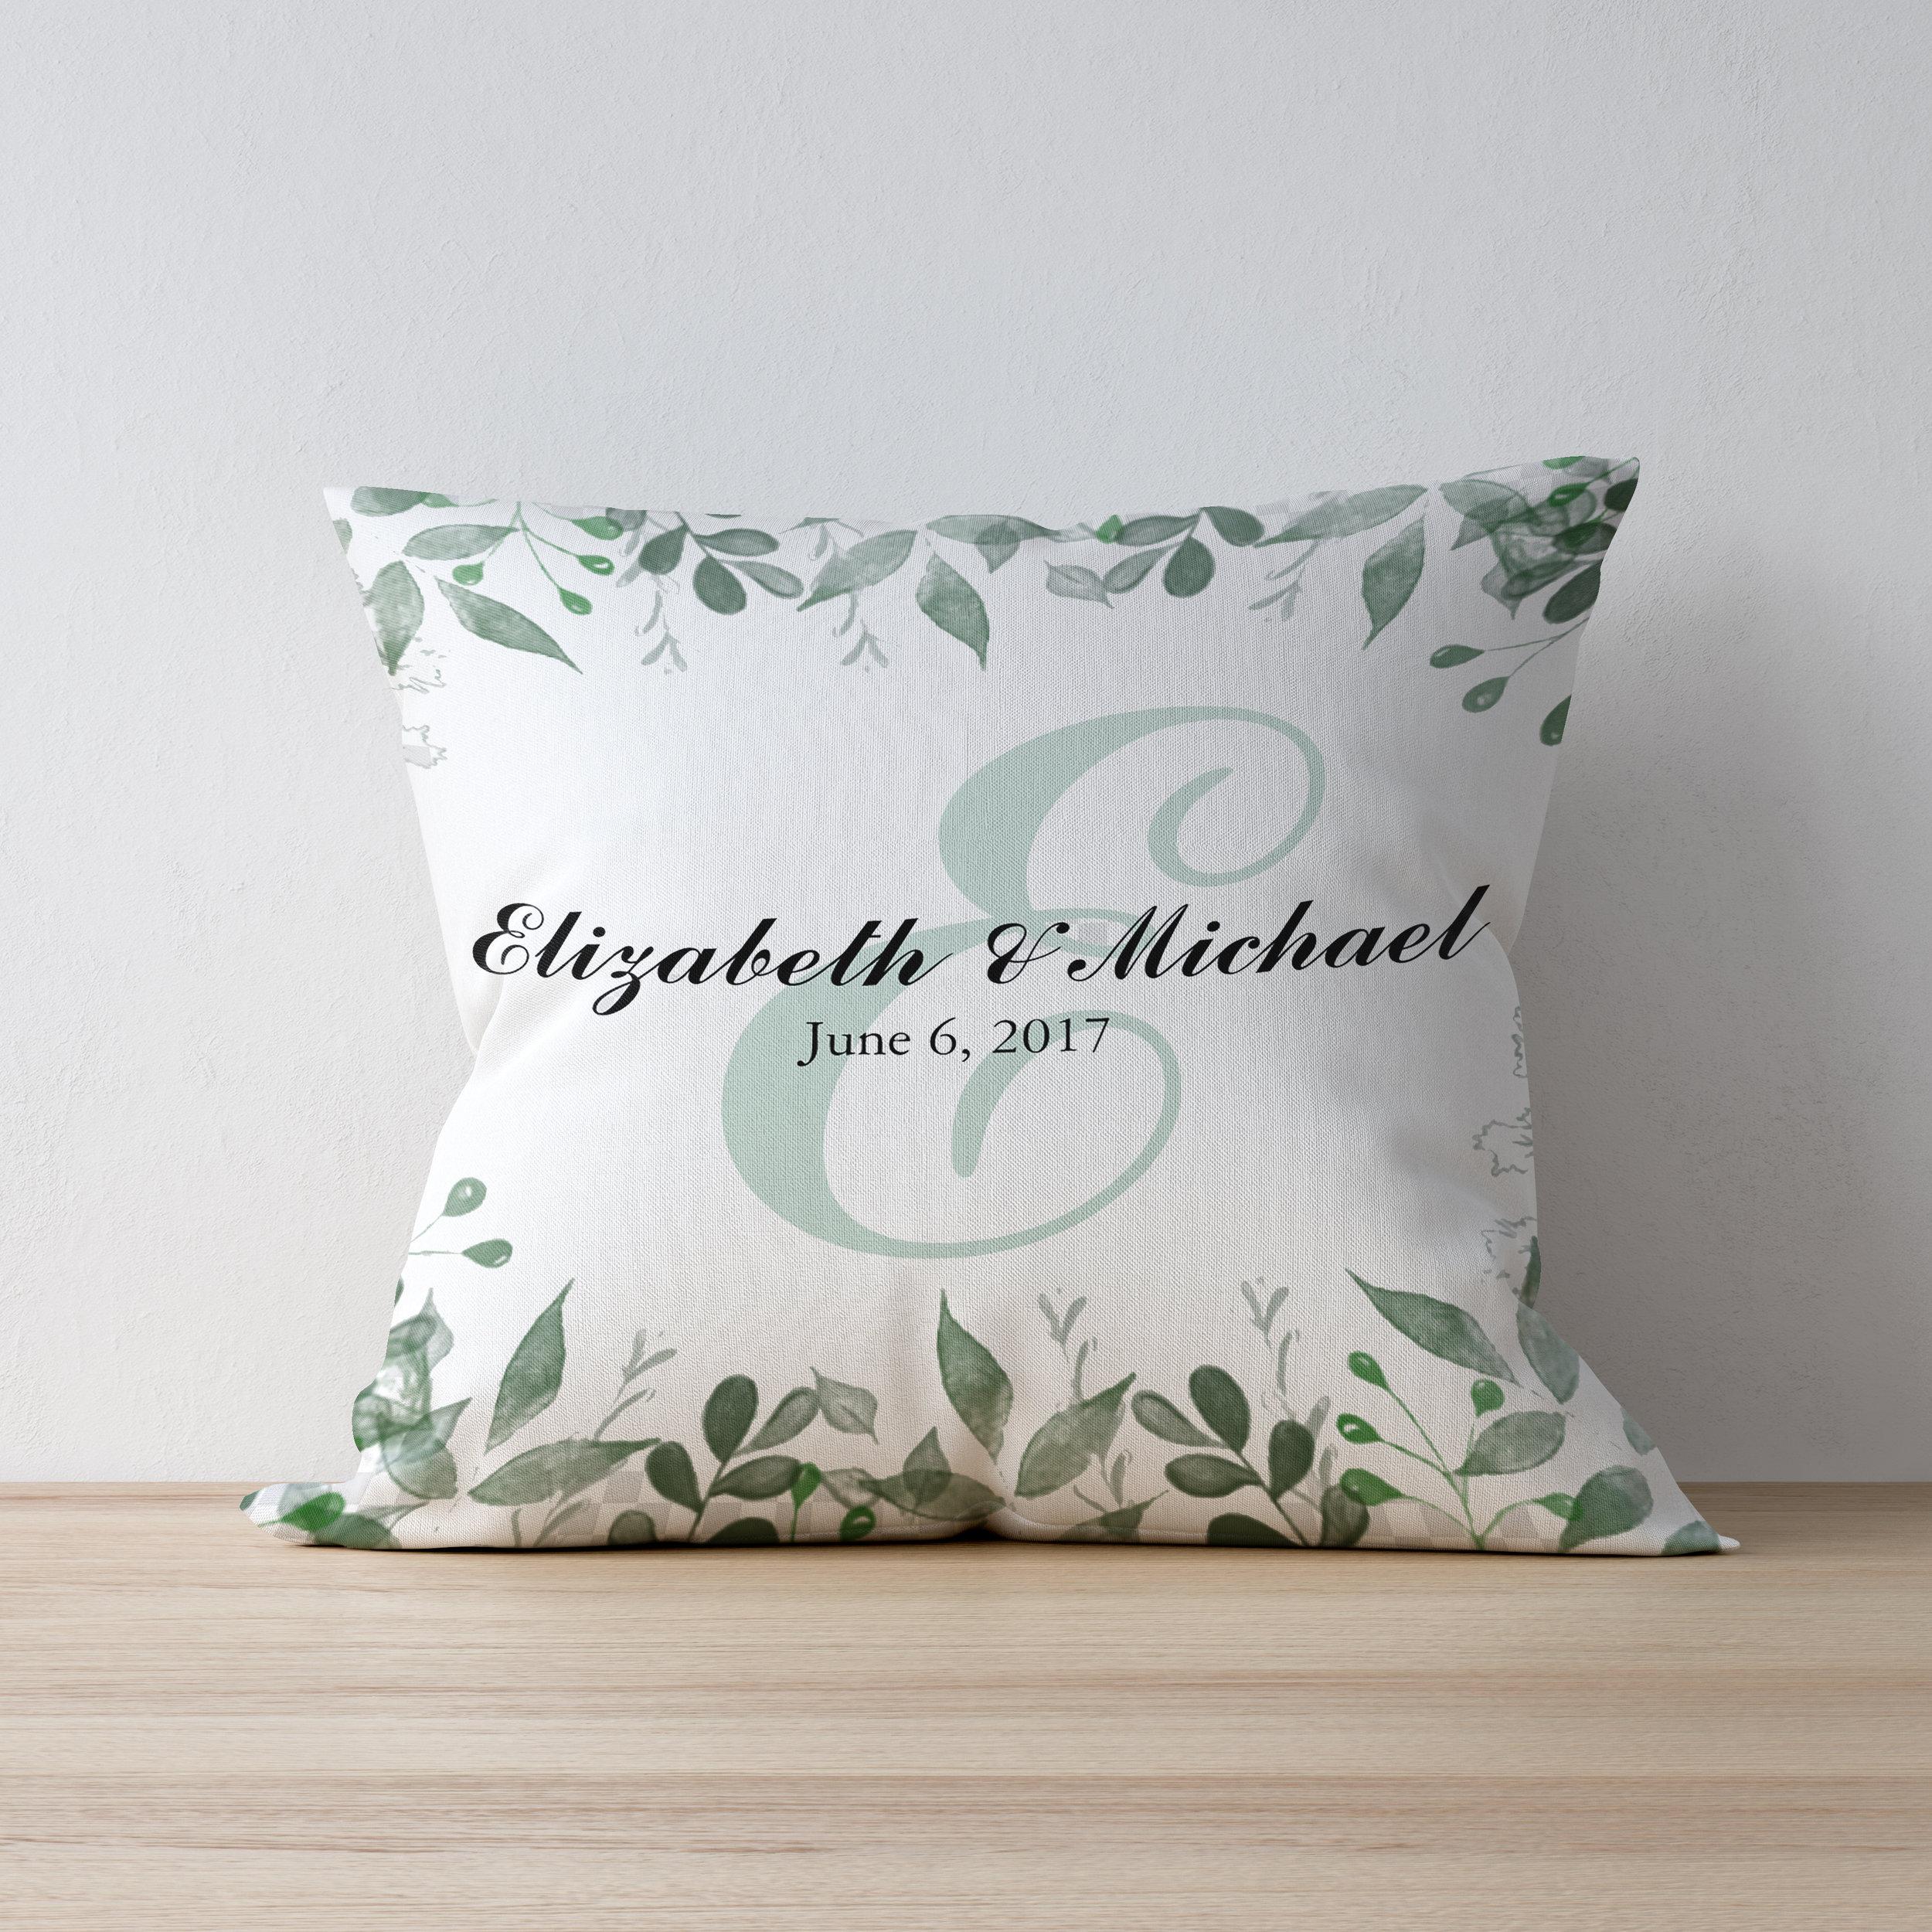 Wedding Date Personalized Greenery Pillow